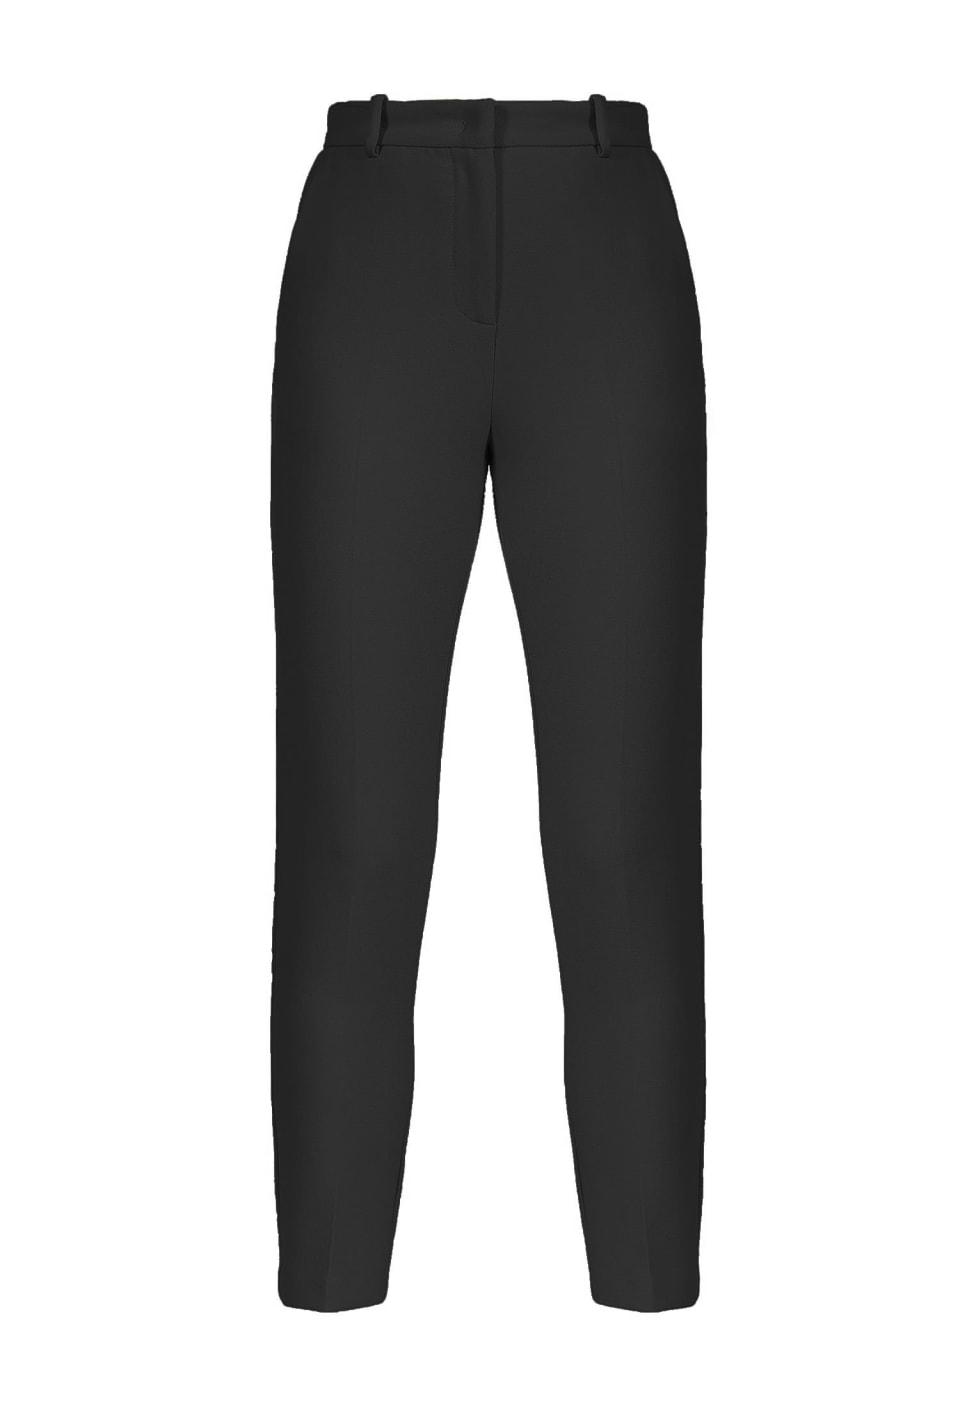 Pantalon en tissu double